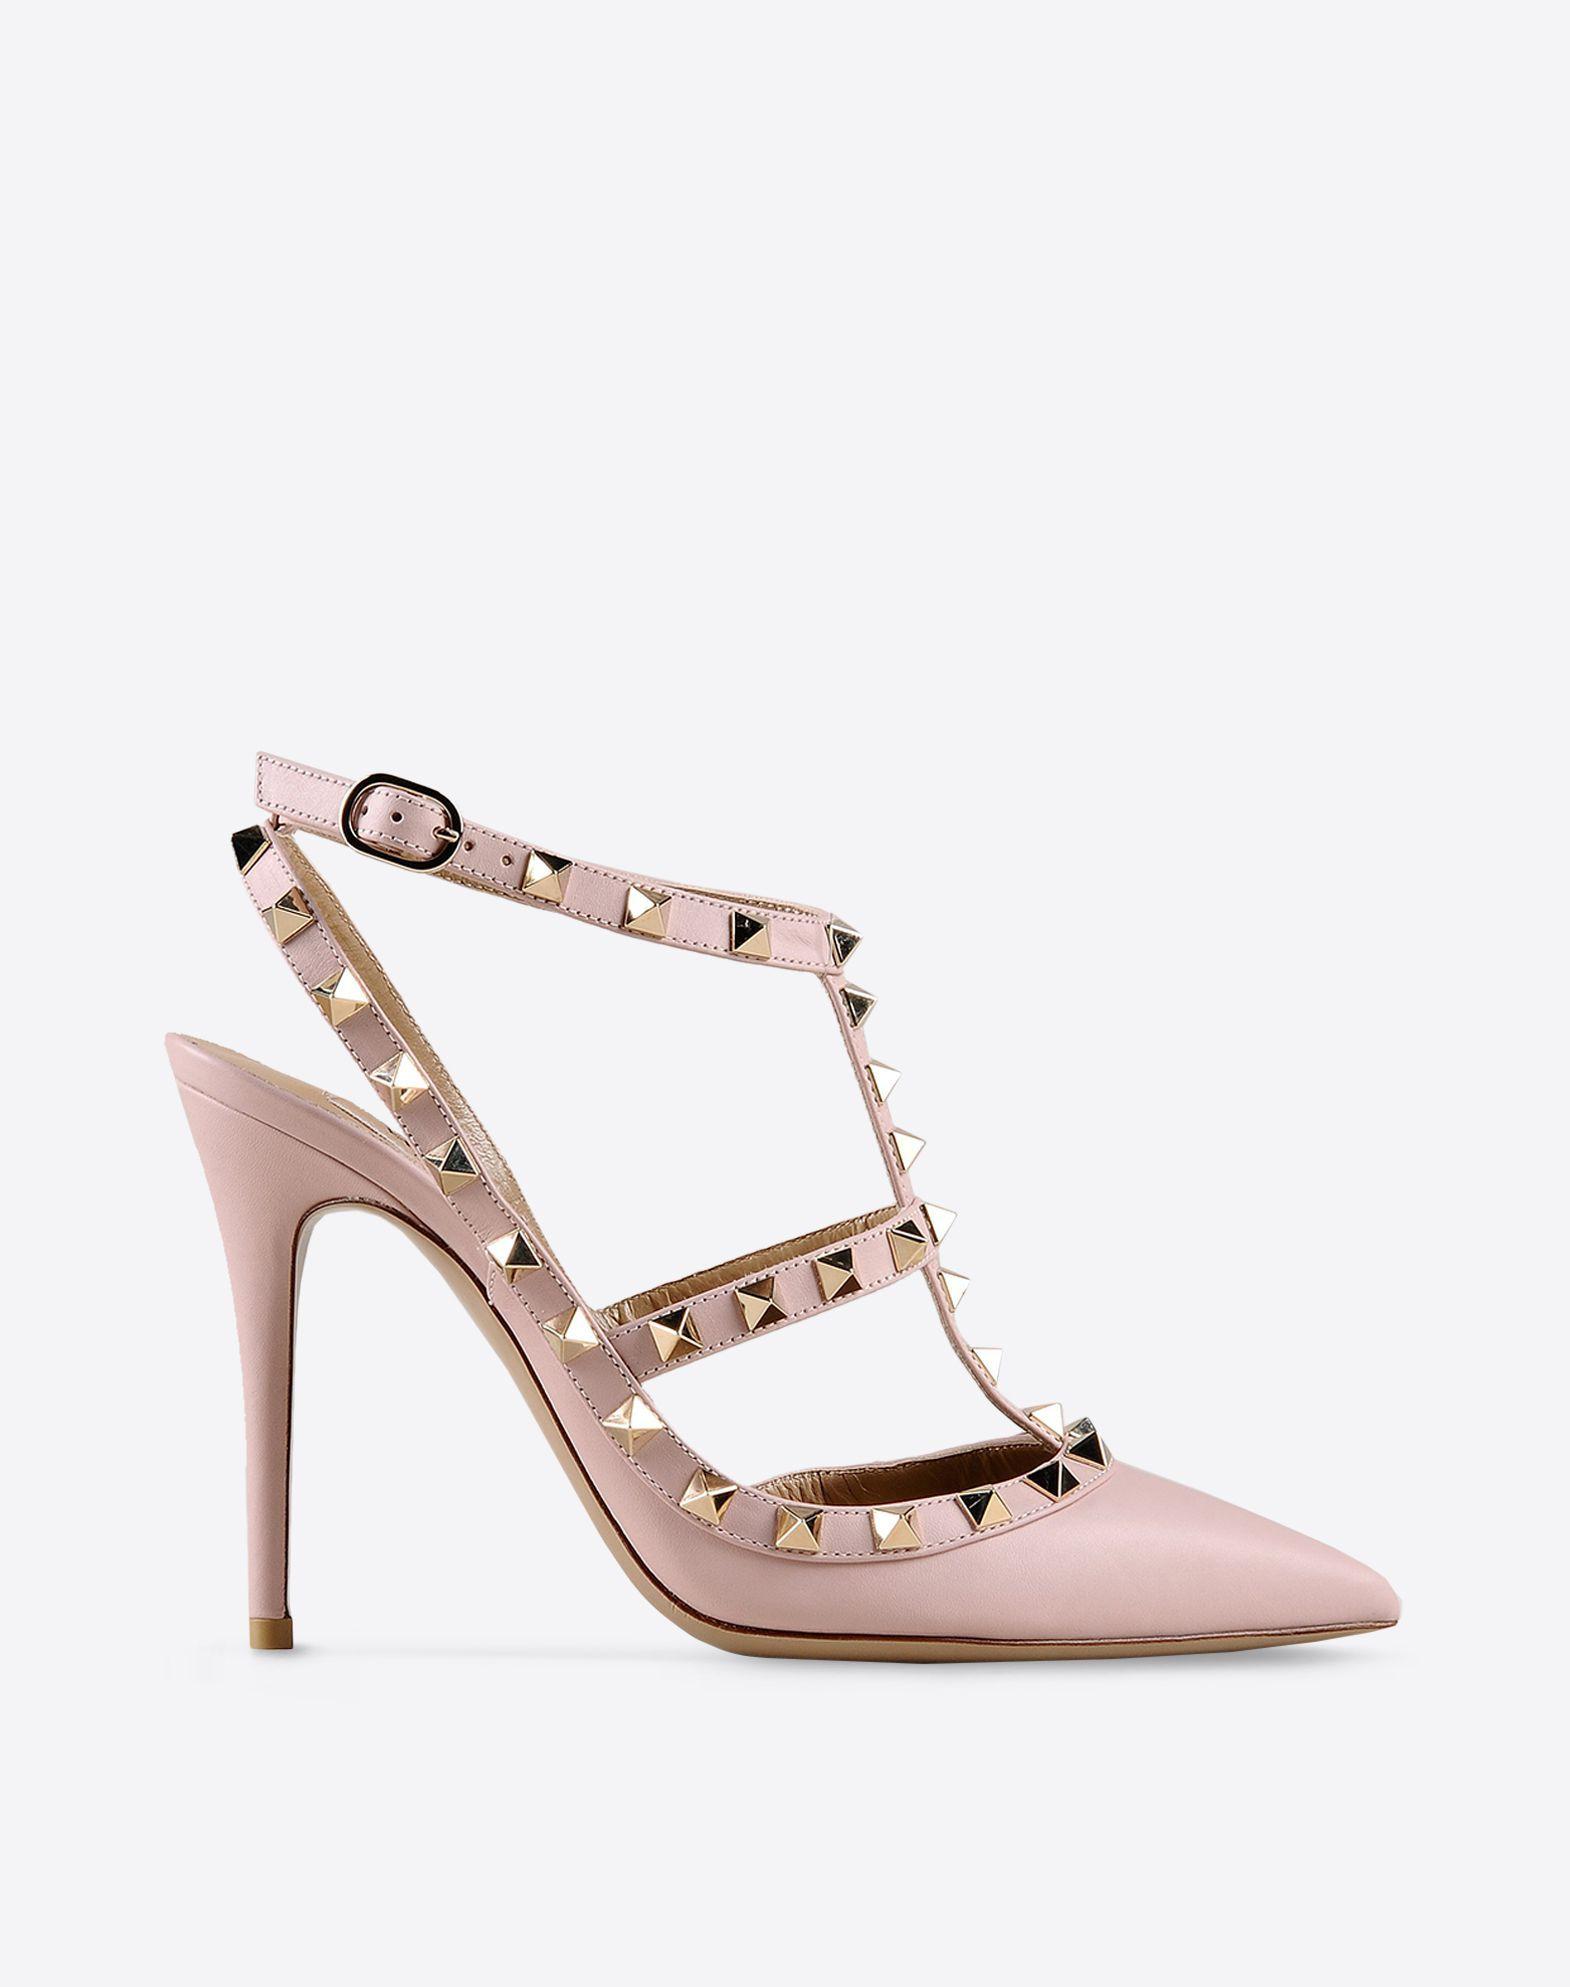 Boutique en ligne Valentino - Chaussure Rockstud à Bride Femme Valentino